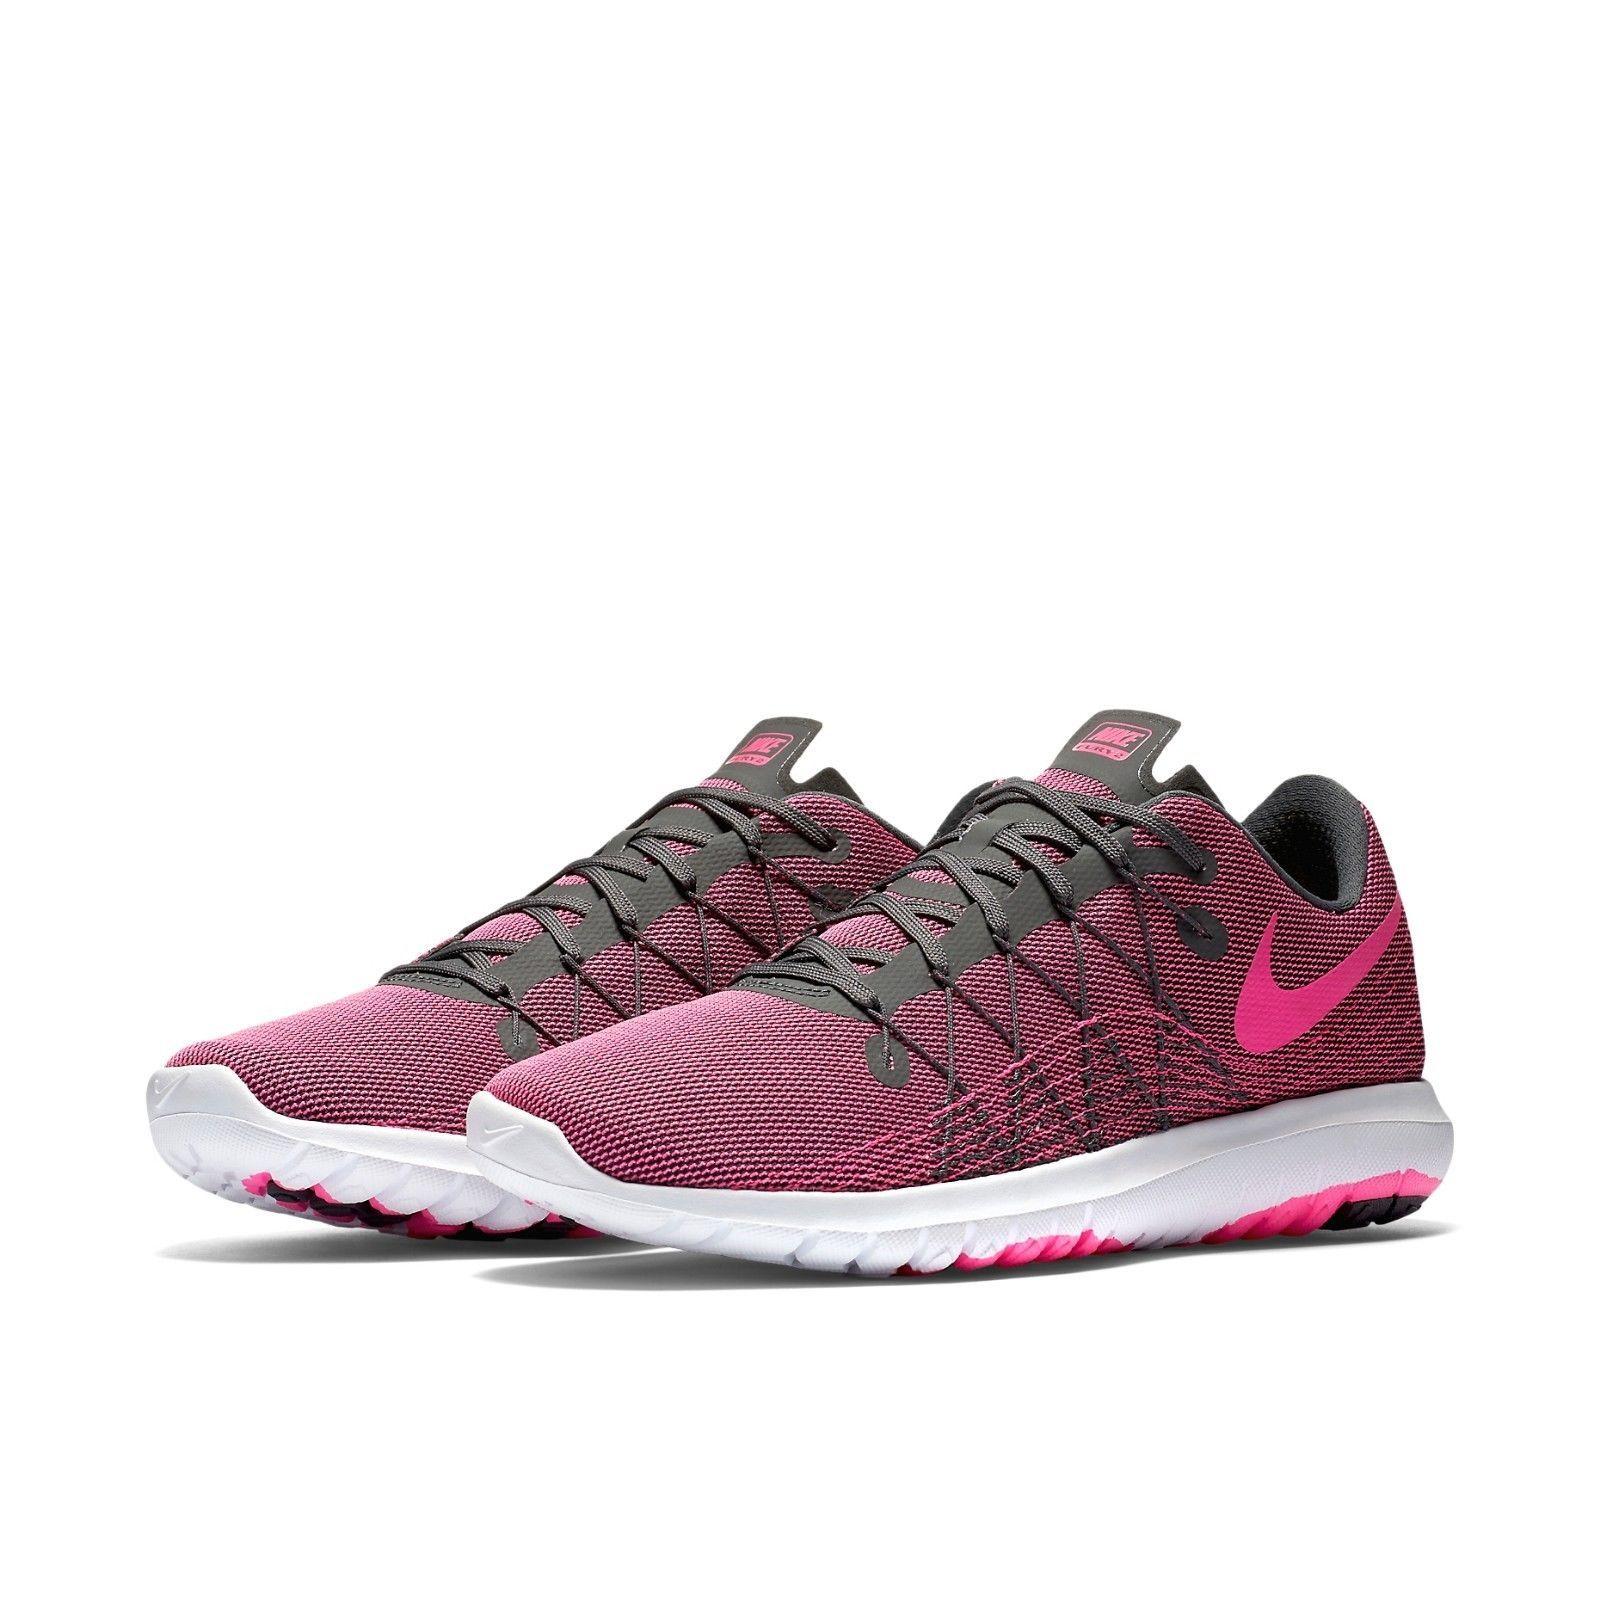 3bbf125892de Women s Nike Flex Fury 2 Running Shoes NEW and similar items. S l1600